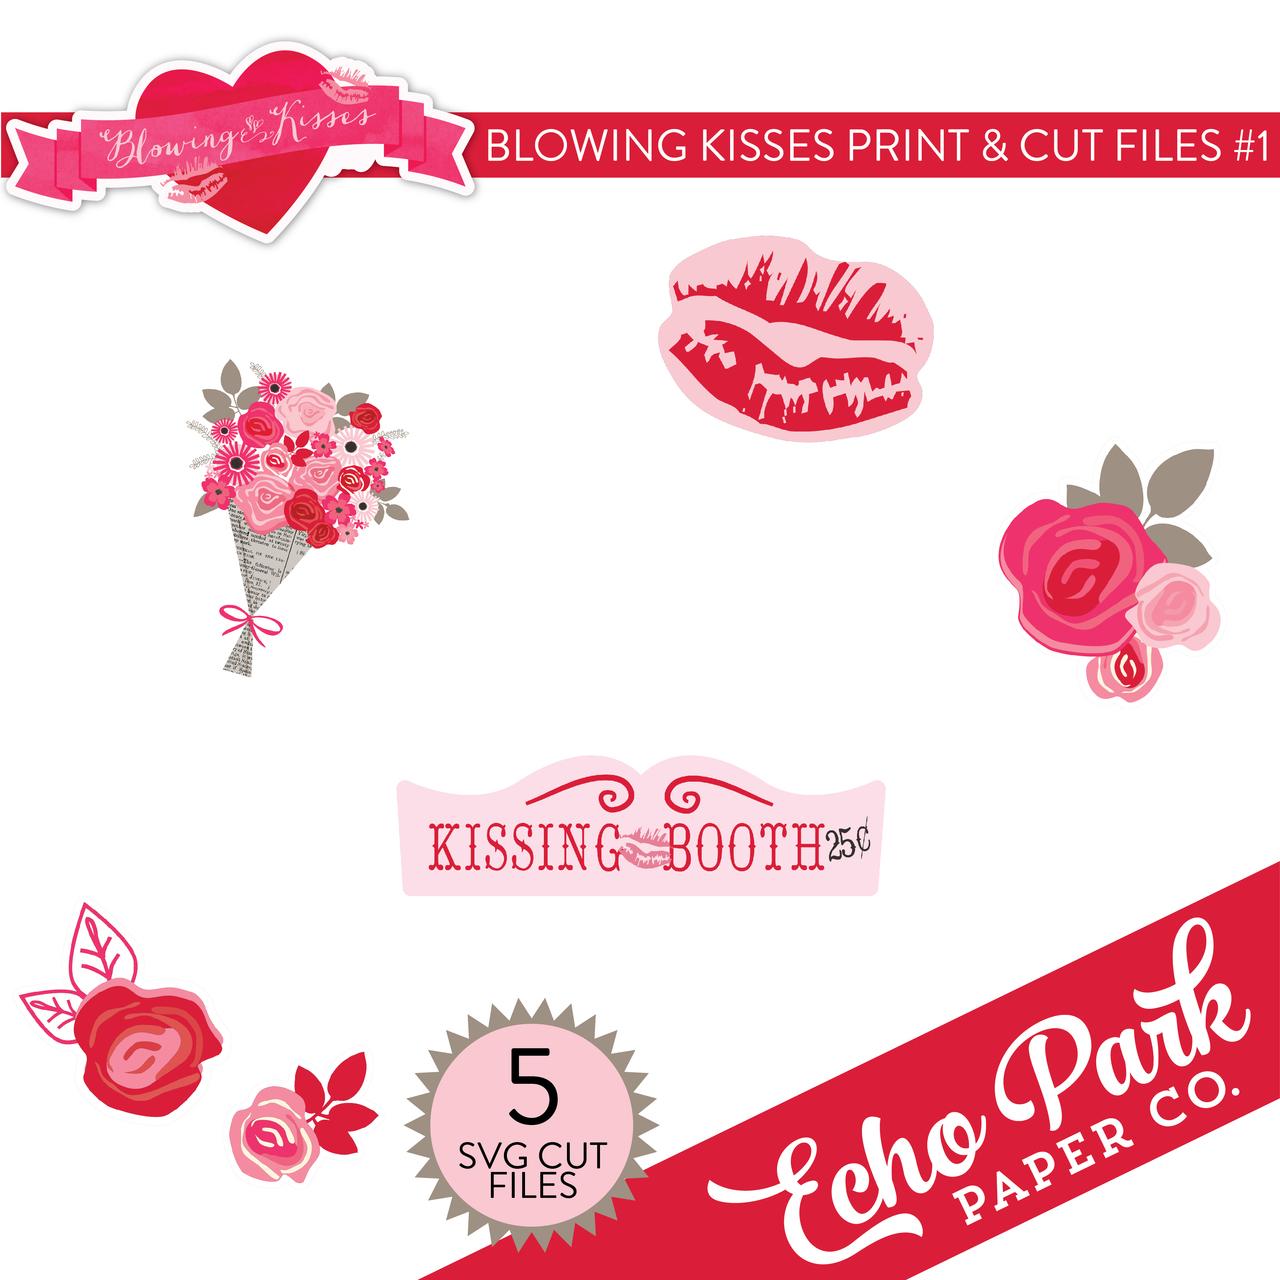 Blowing Kisses Print & Cut Files #1